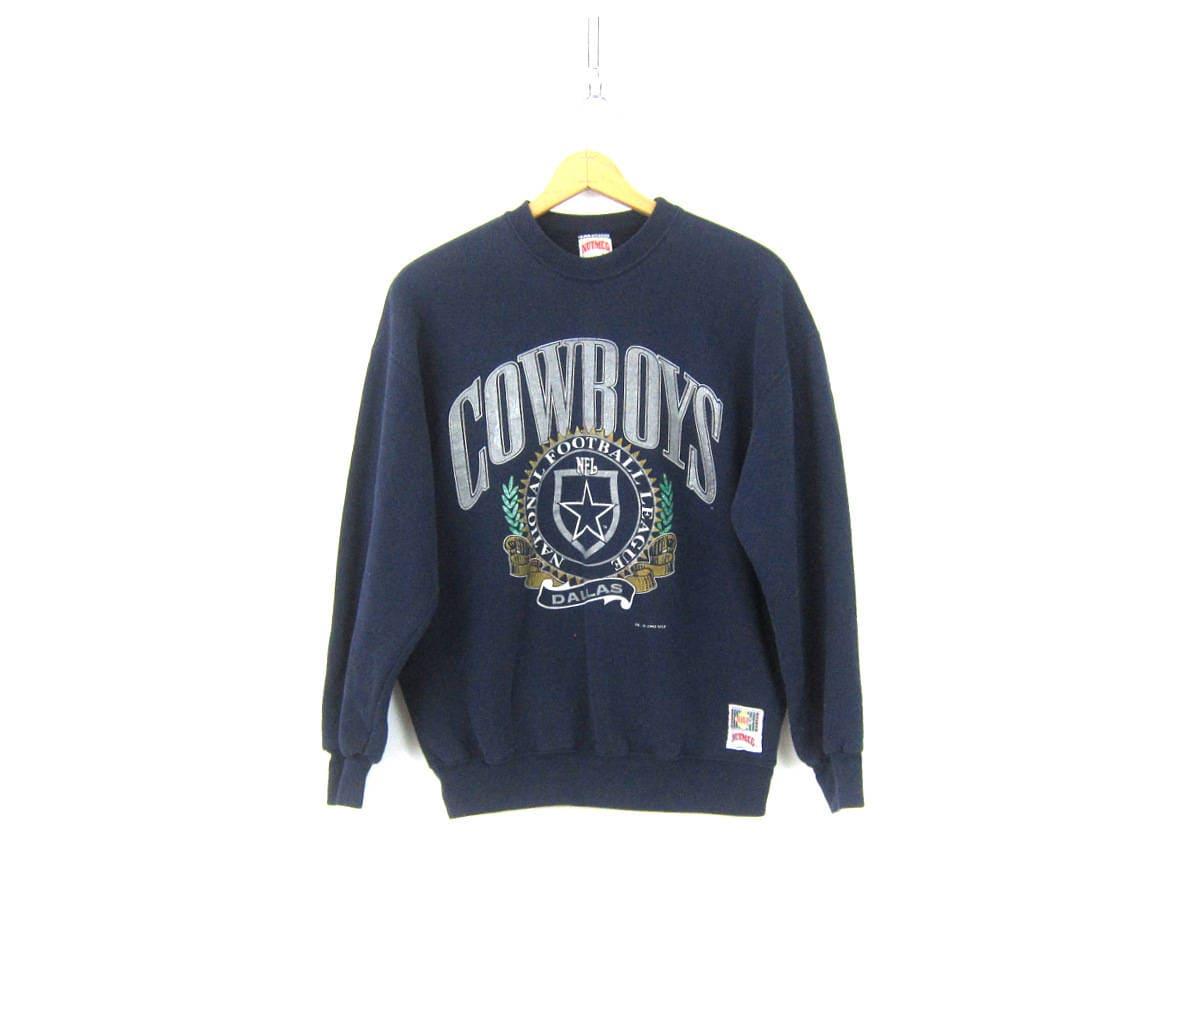 5e8043057 Dallas Cowboys Football Sweatshirt Baggy Blue sweatshirt Sporty ...